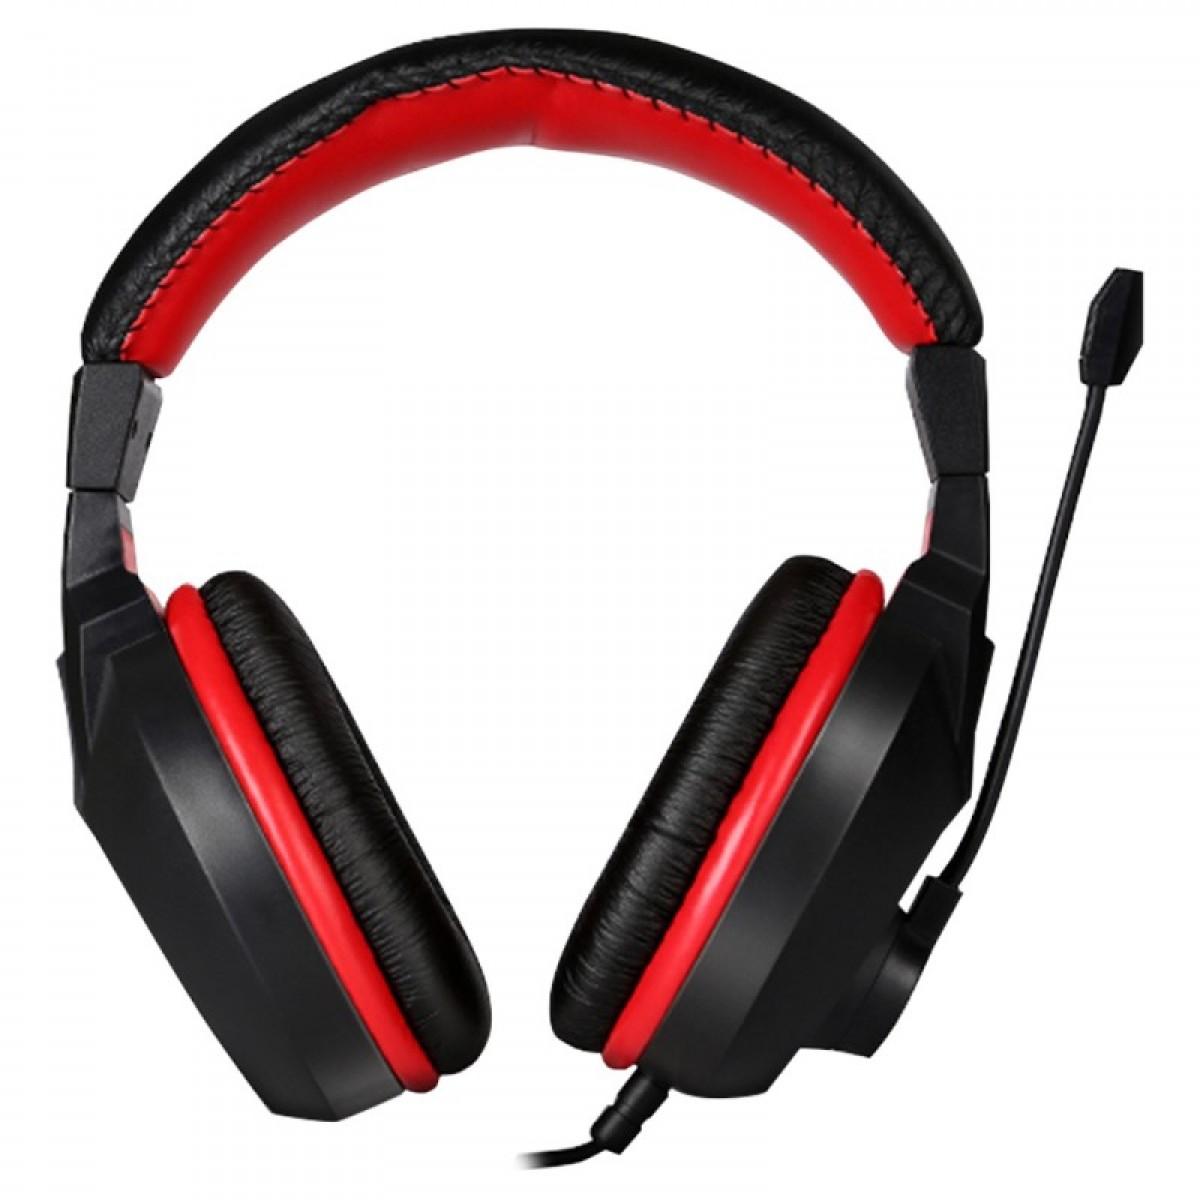 Headset Gamer Marvo Scorpion H8321 Preto/Vermelho